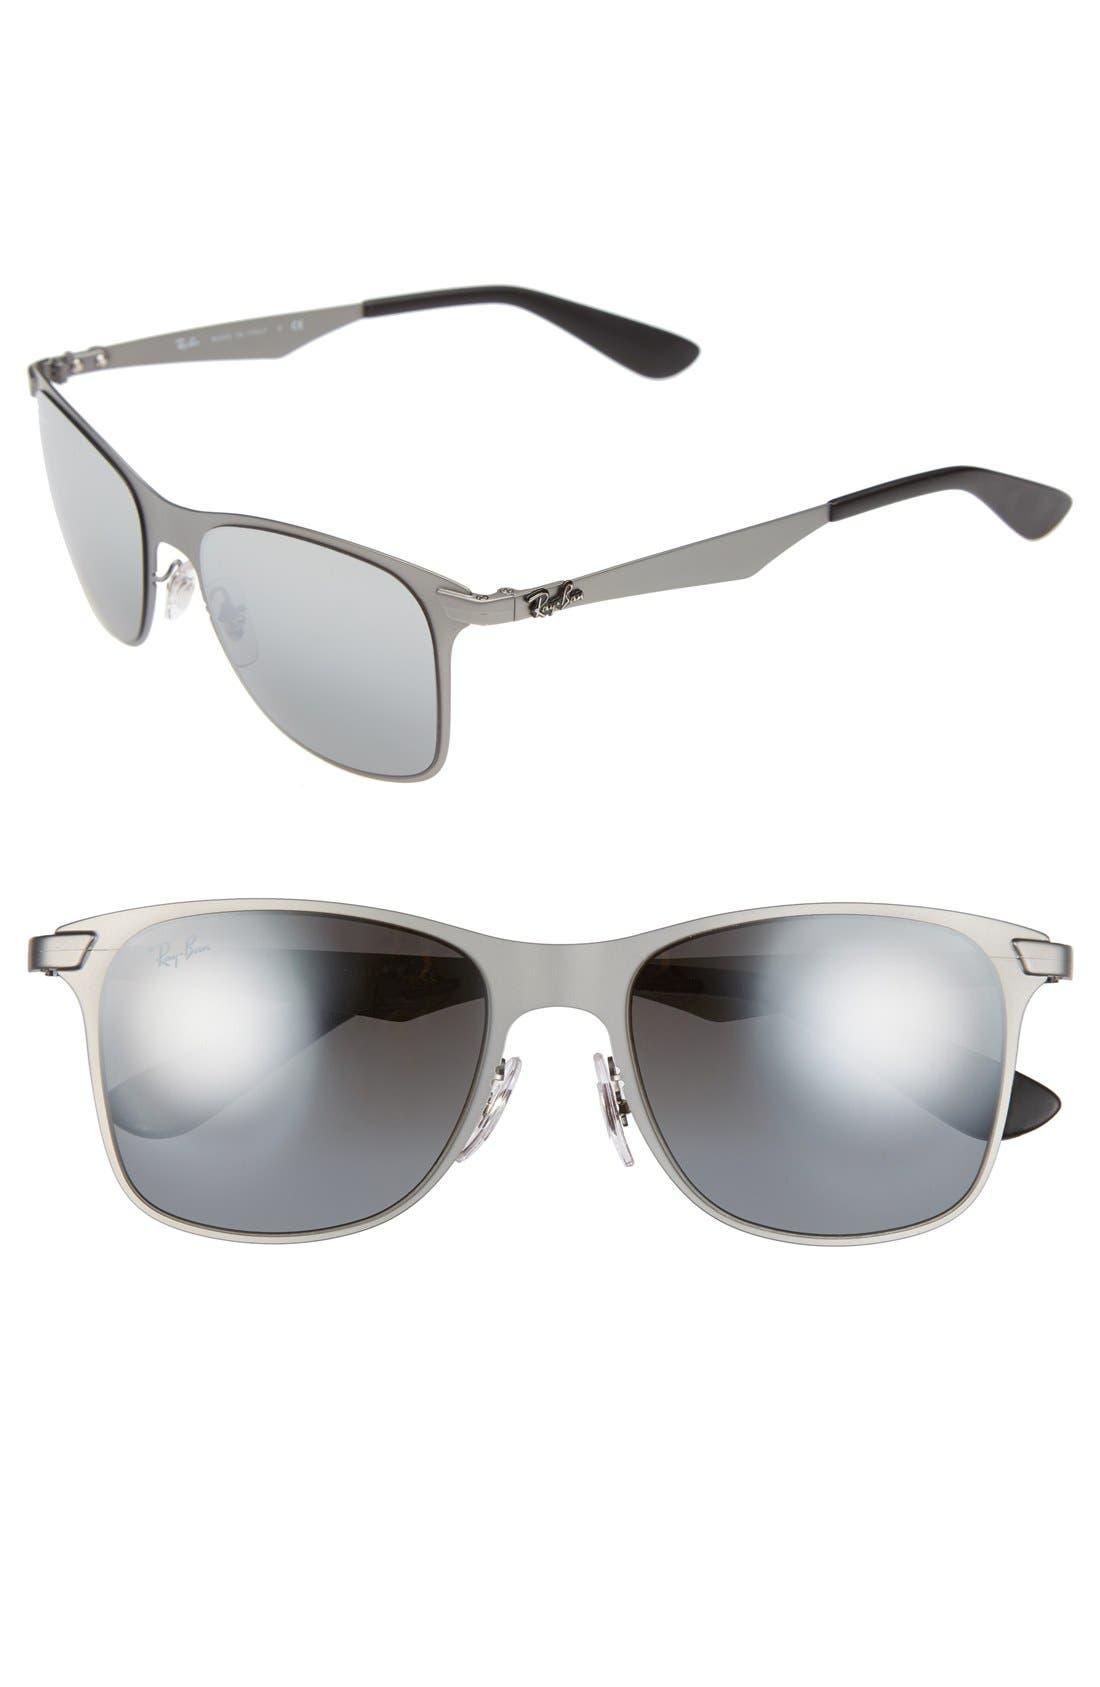 Alternate Image 1 Selected - Ray-Ban 'Steel Man' 52mm Sunglasses